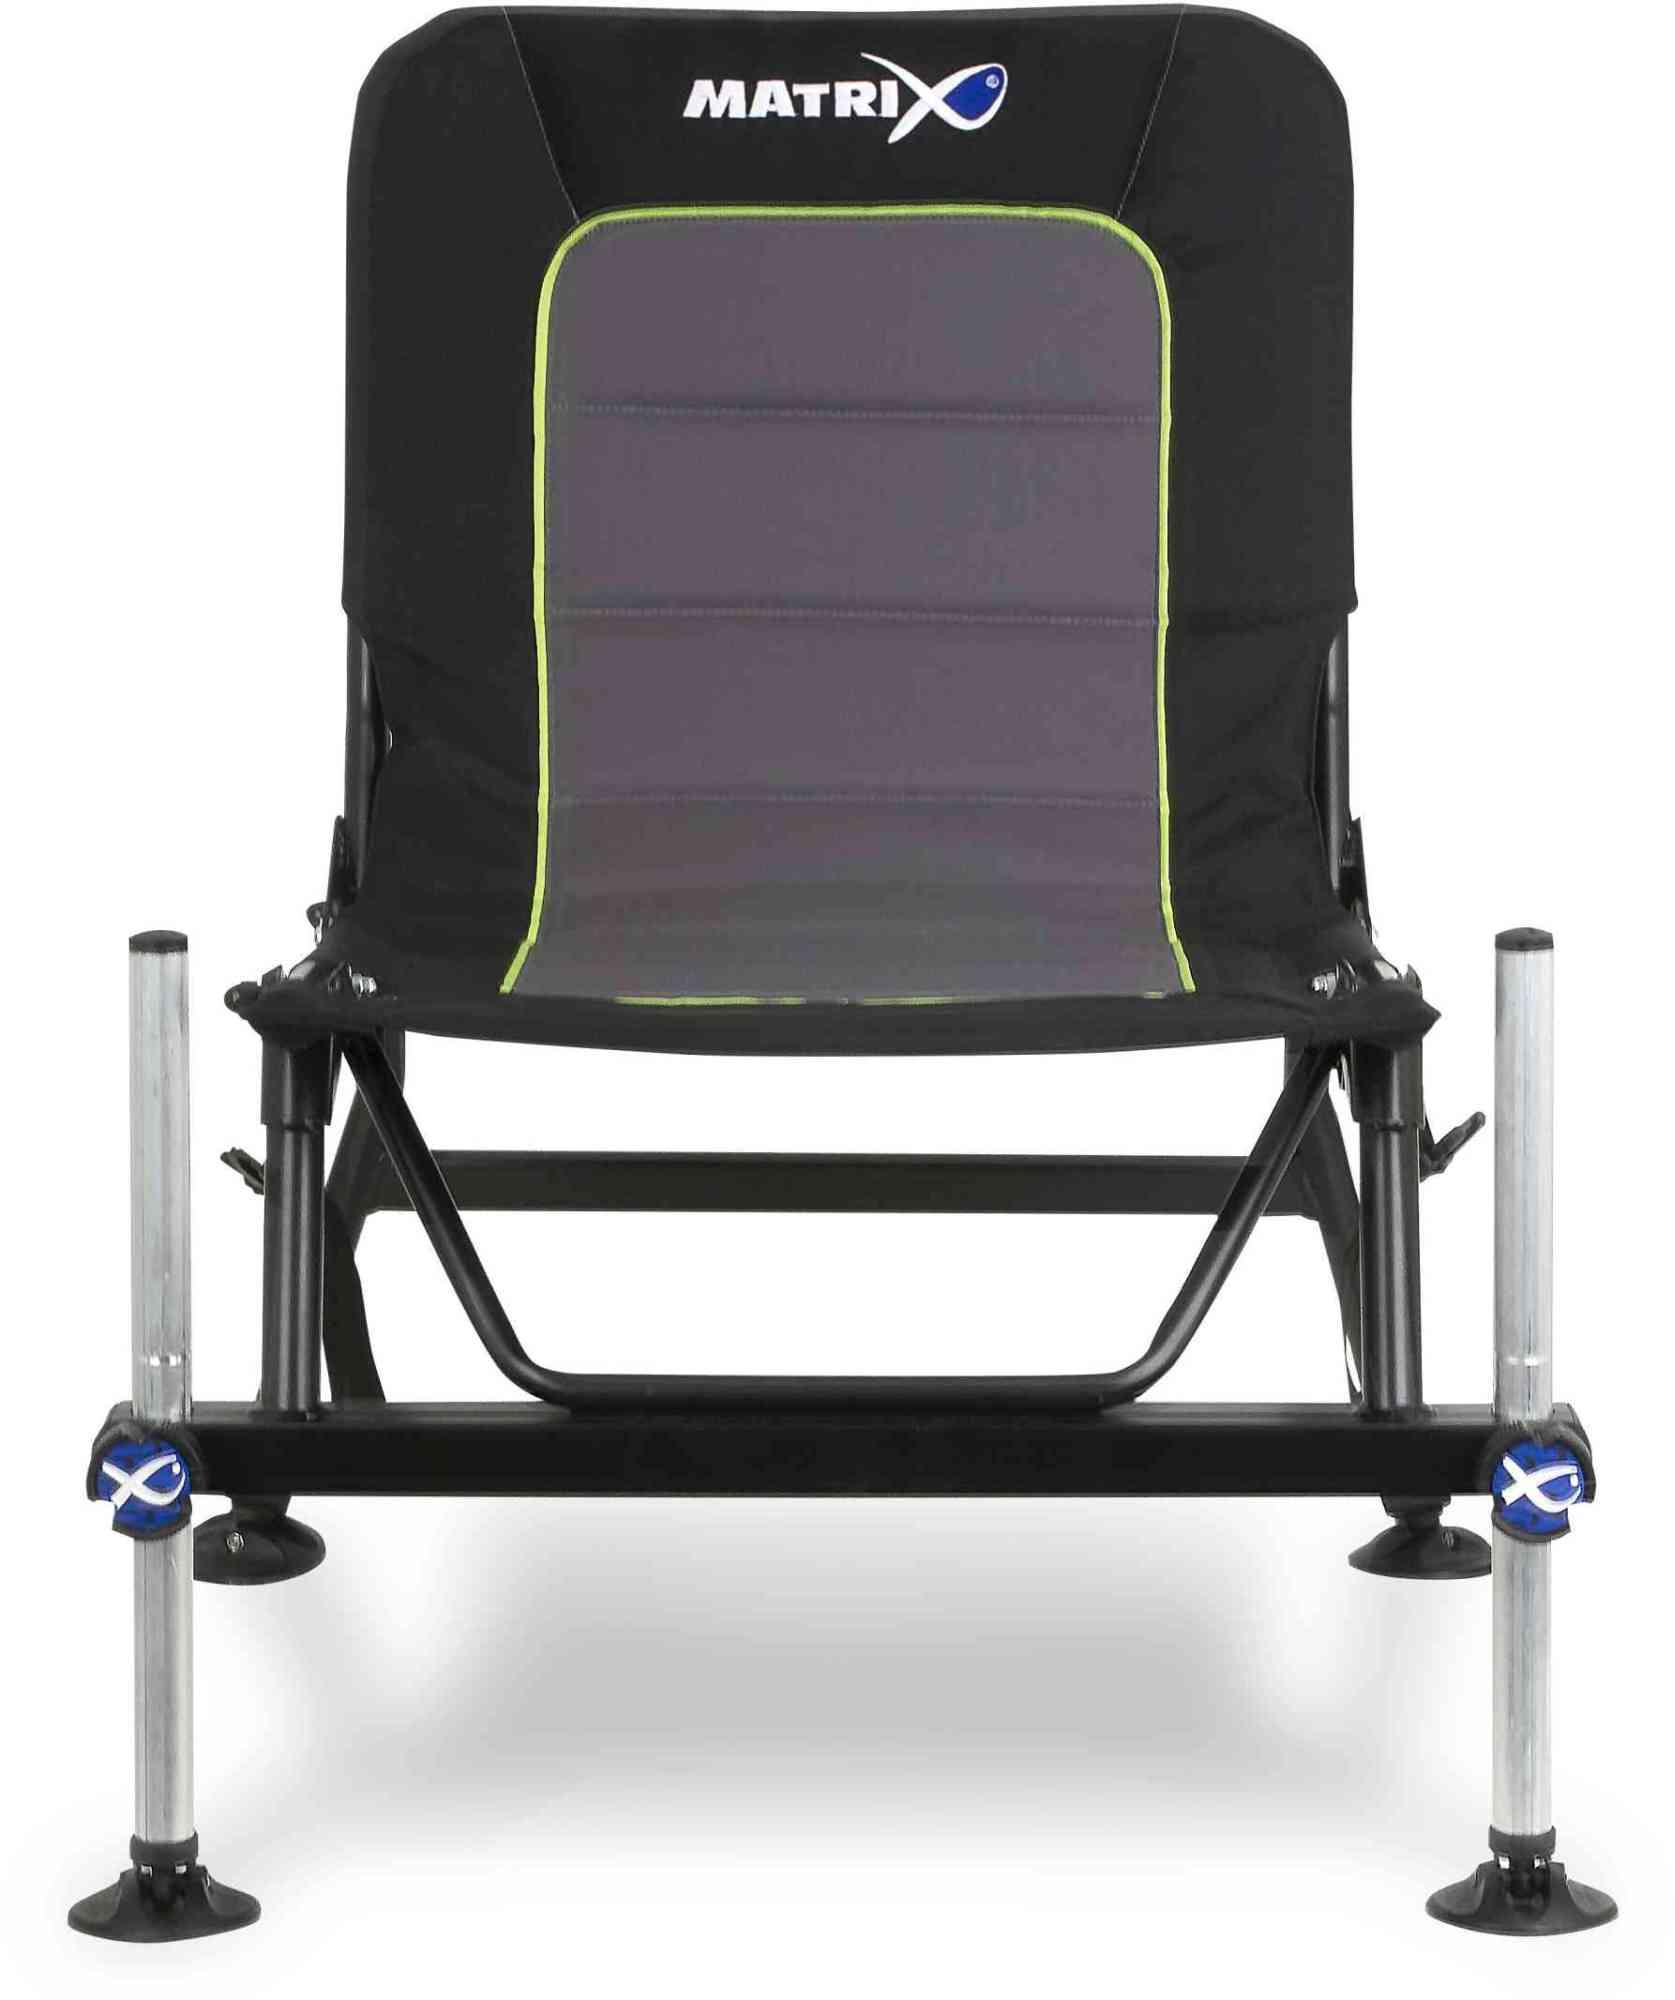 angling chair accessories norwalk sofa and austin fox matrix accessory fishingtackle24 angelbedarf angelruten gbc001a jpg